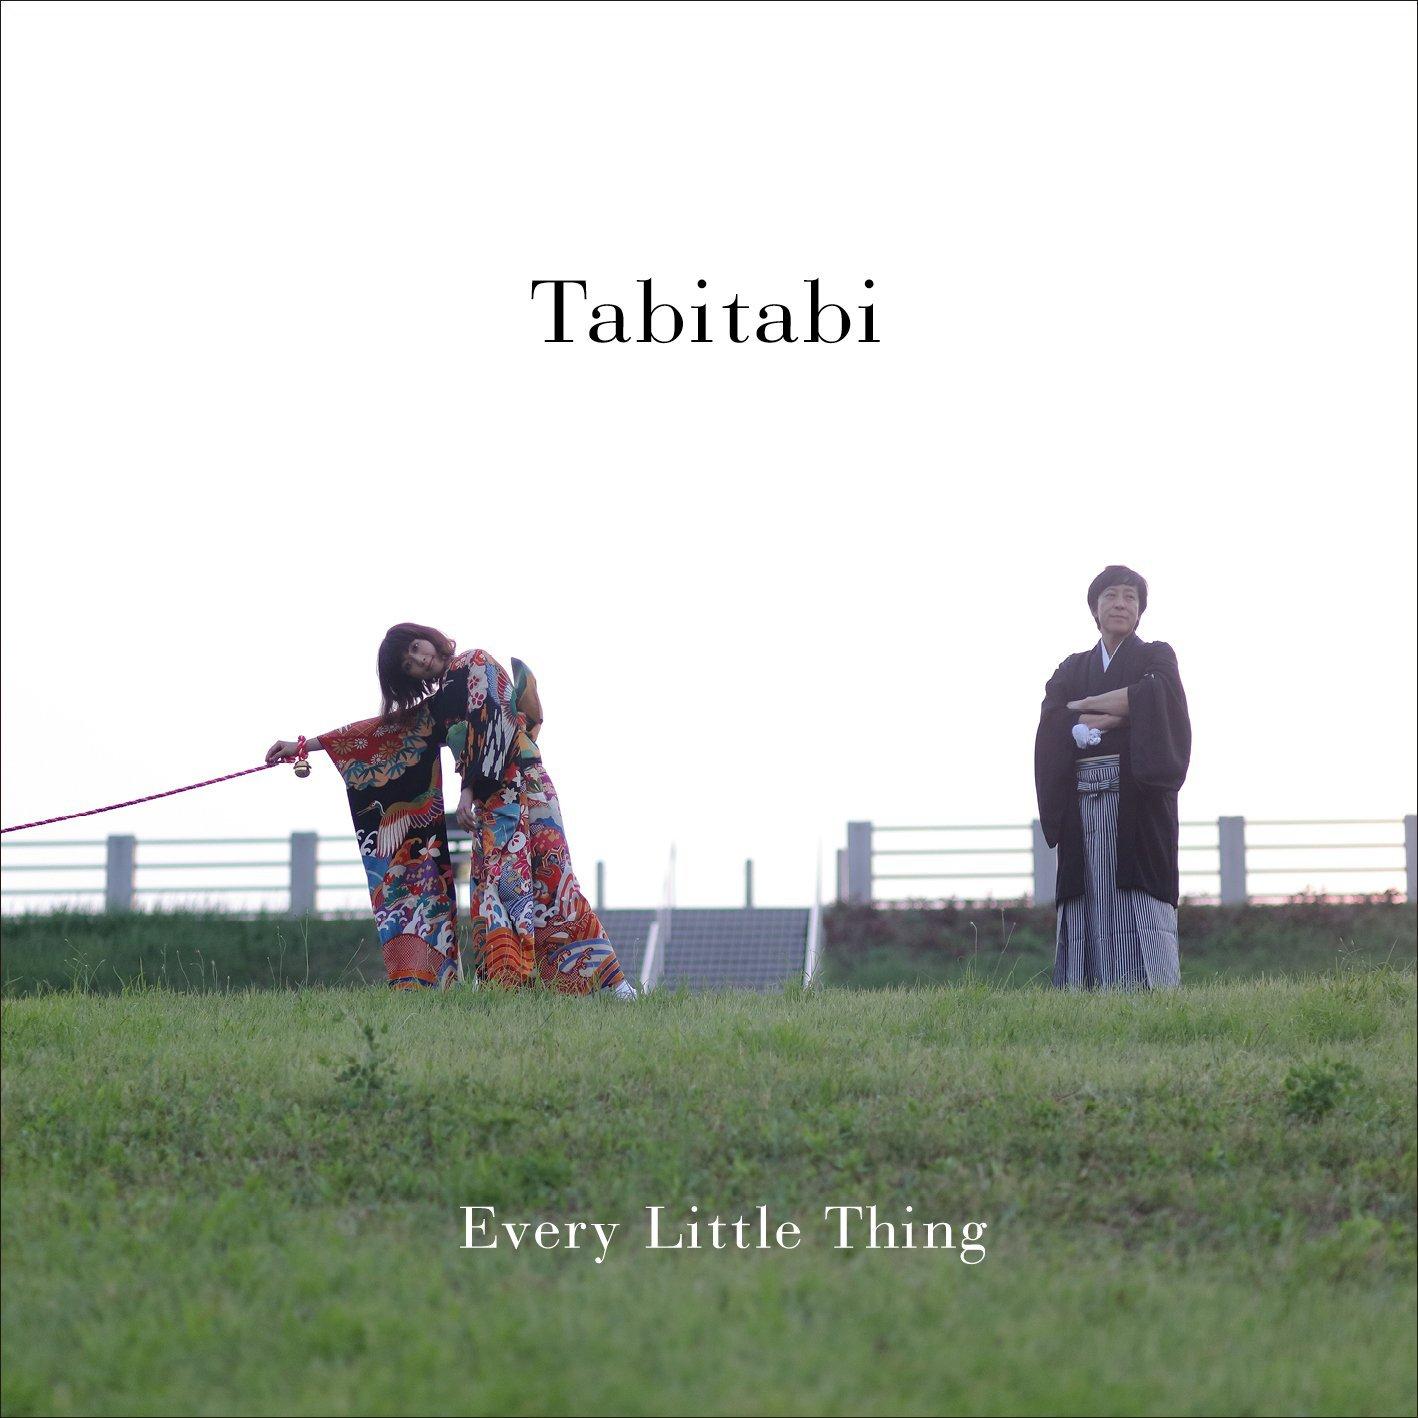 20151120.01 Every Little Thing - Tabitabi cover.jpg